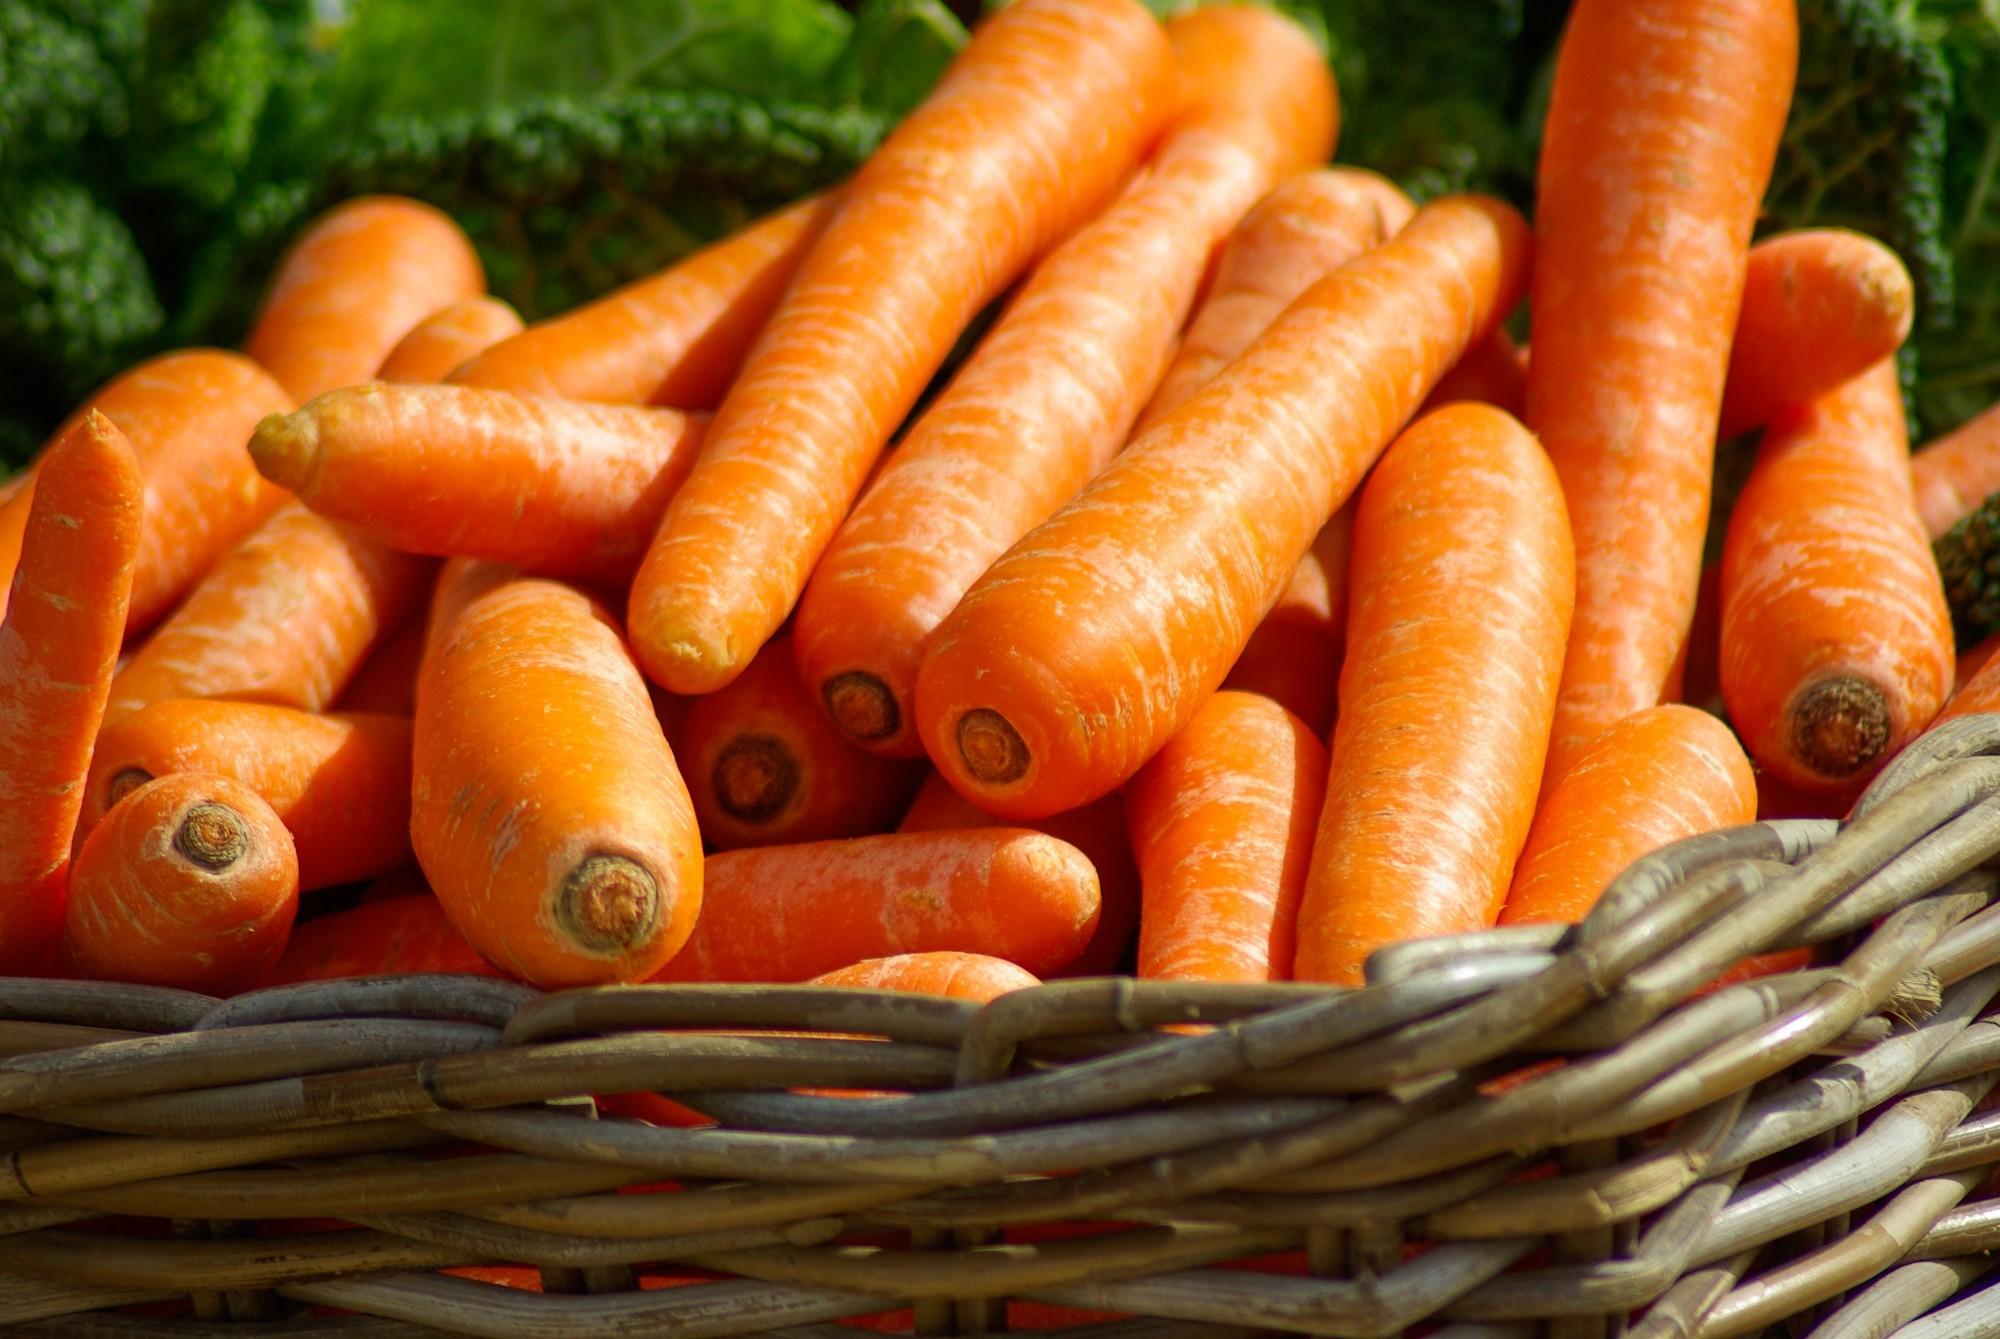 do carrots help your eyesight?